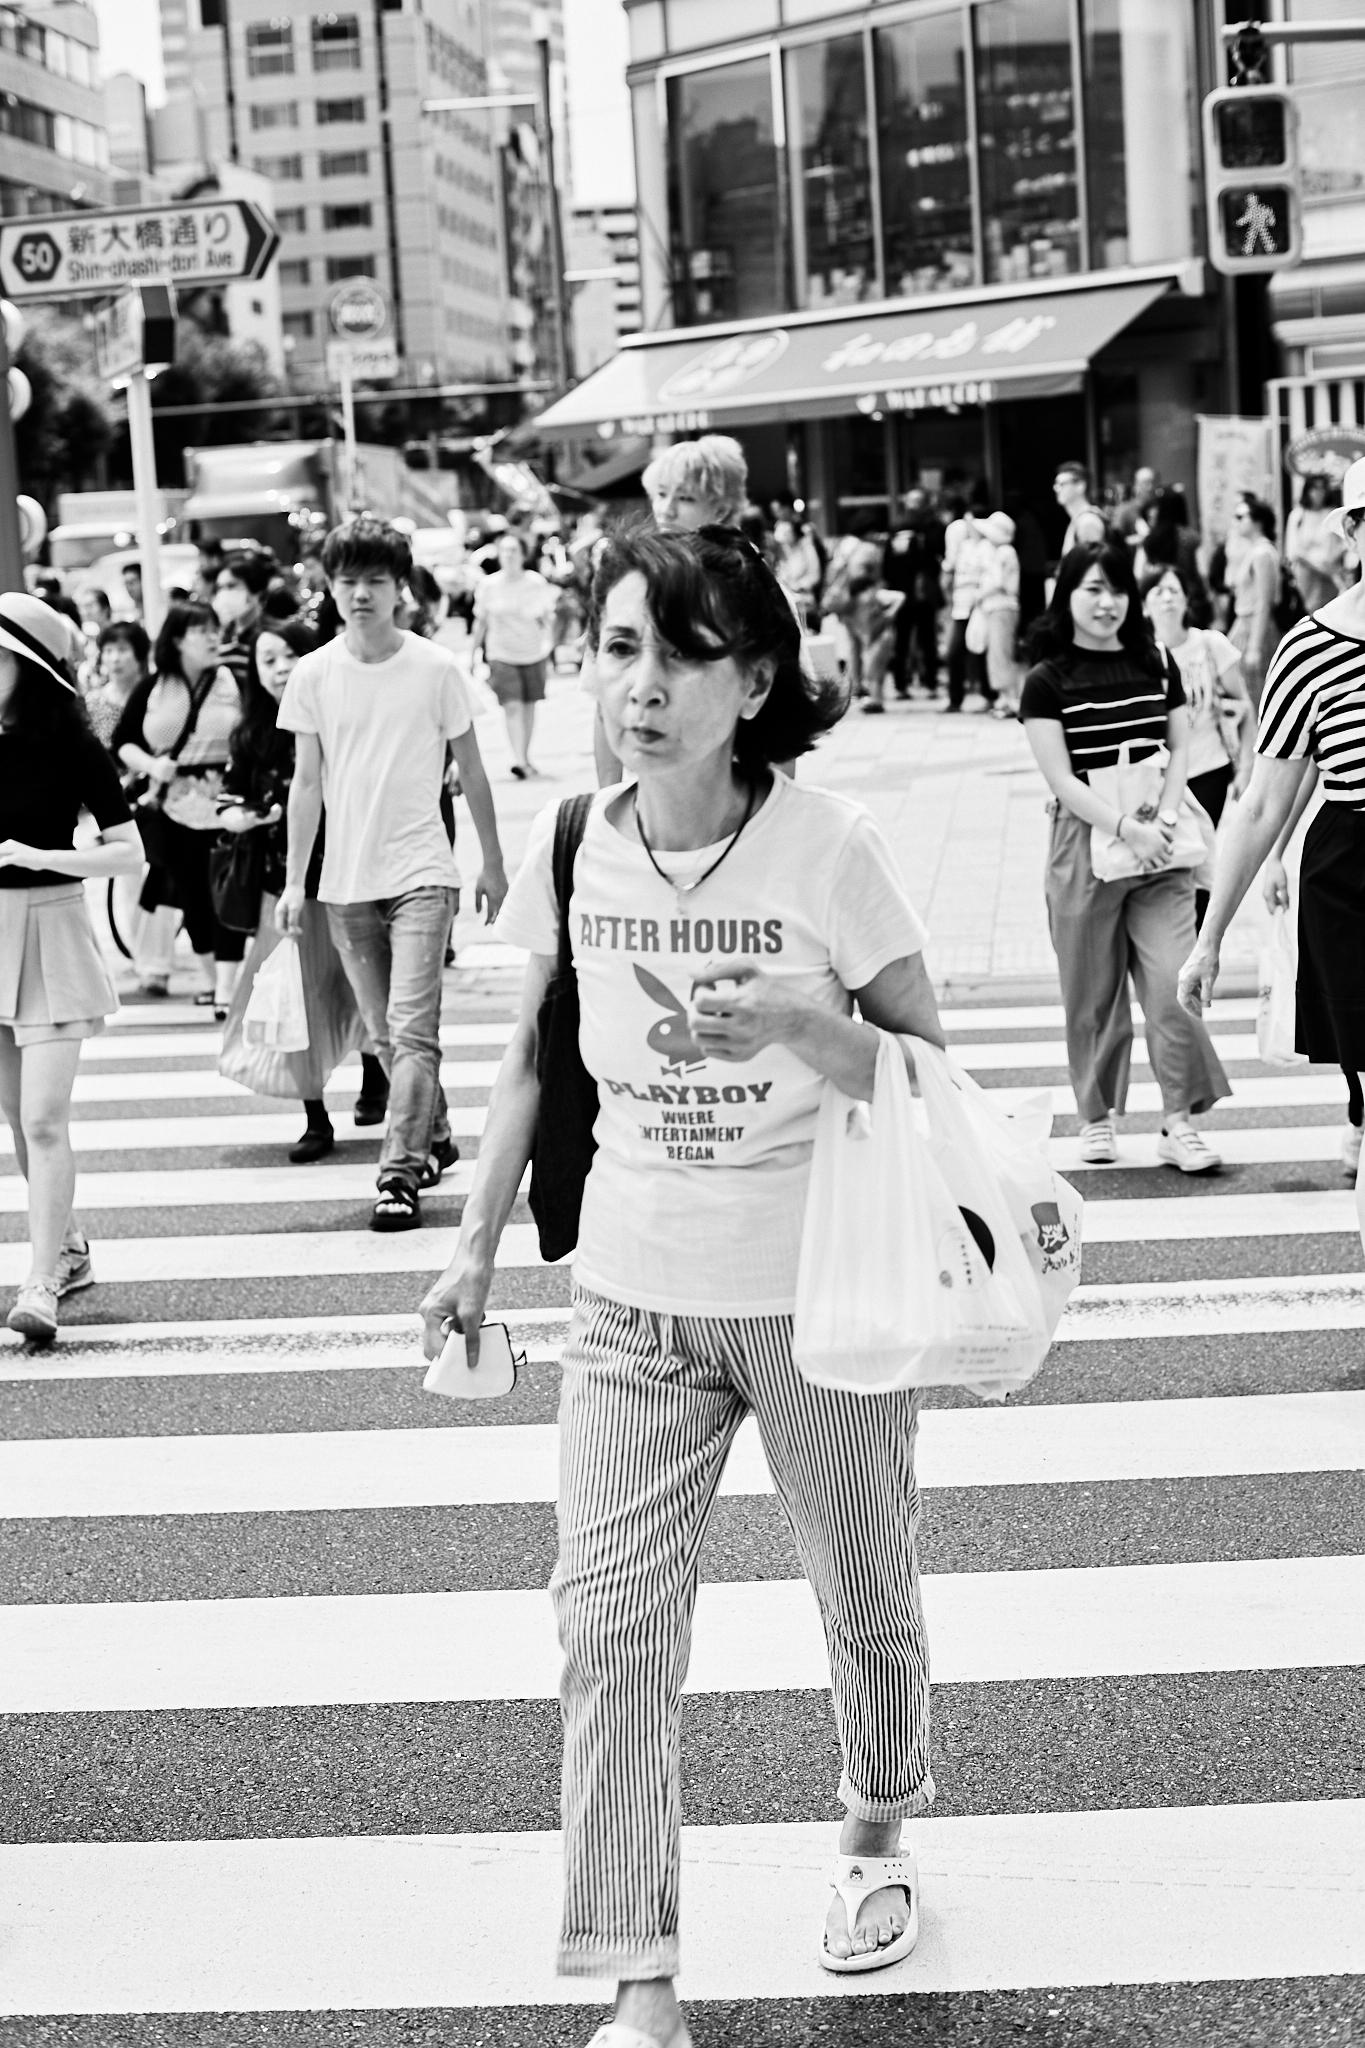 SnapPilots_17-07-05_Tokyo2017_bnw_52.jpg